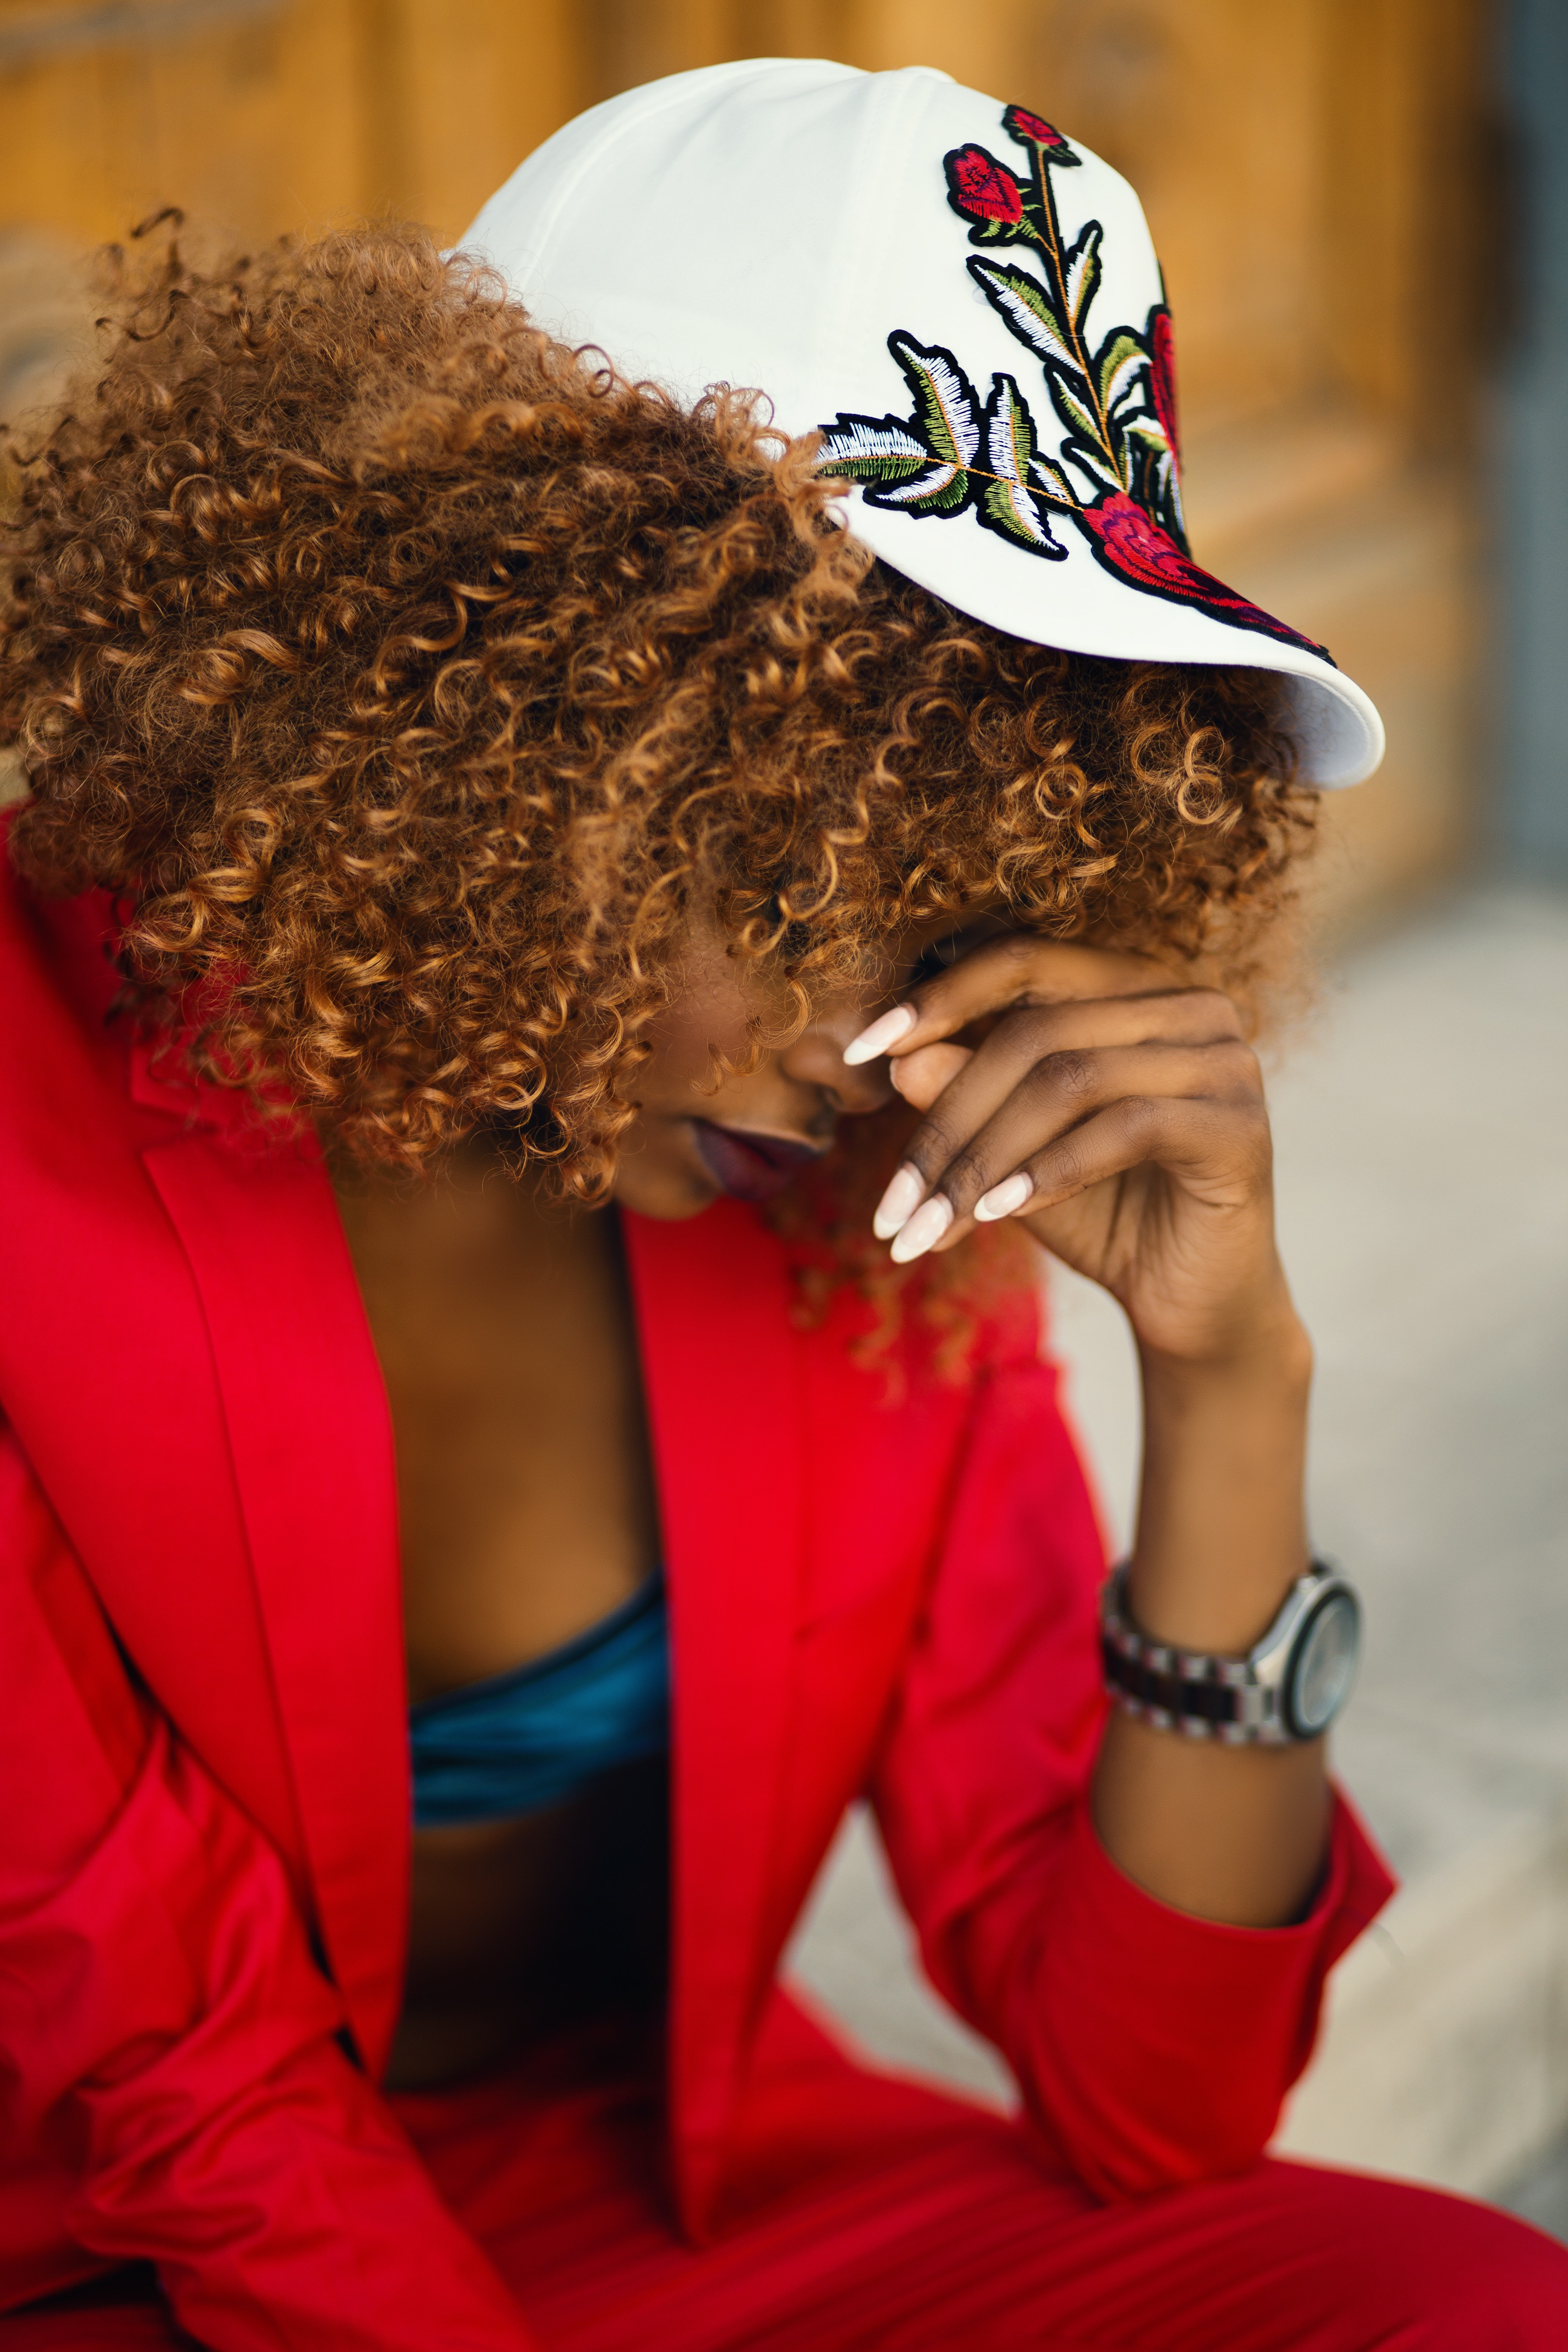 Pensive woman.   https://www.wocdetox.com/body-detox-a-natural-path.html